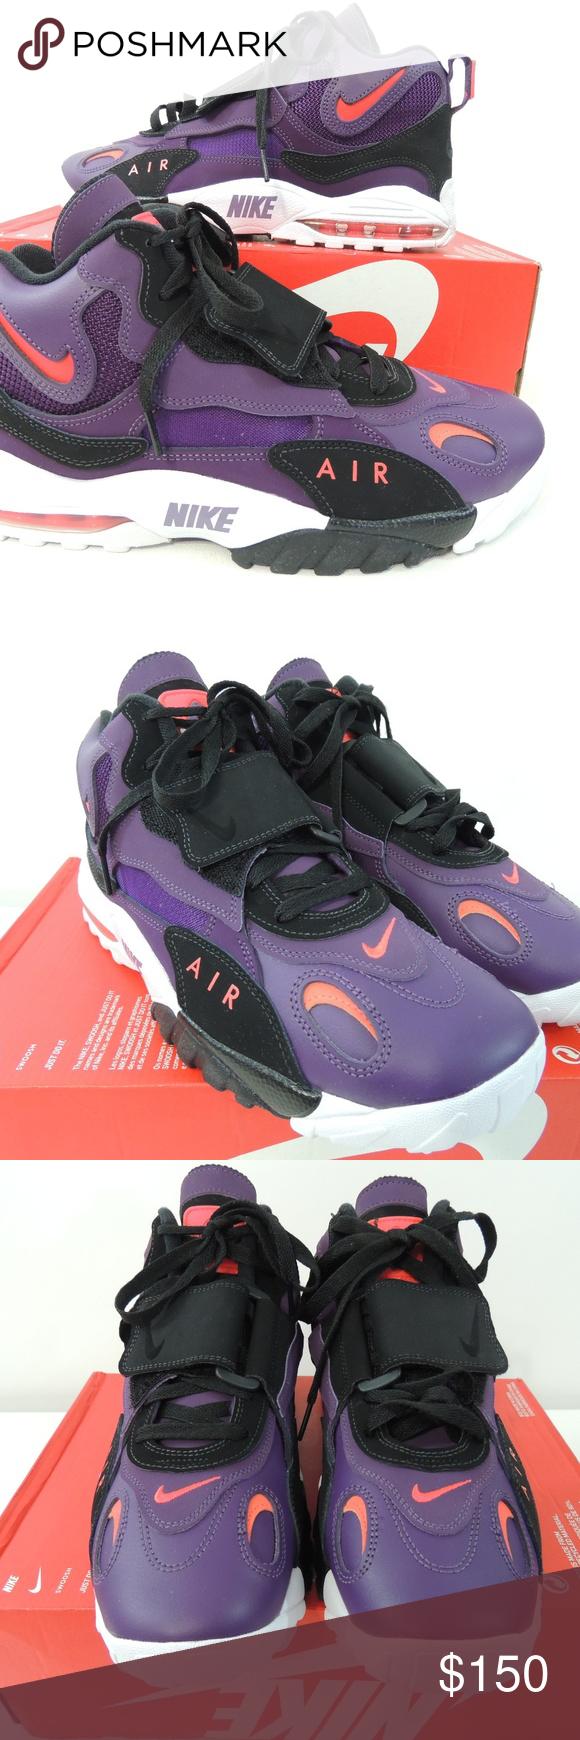 nike air max speed turf night purple